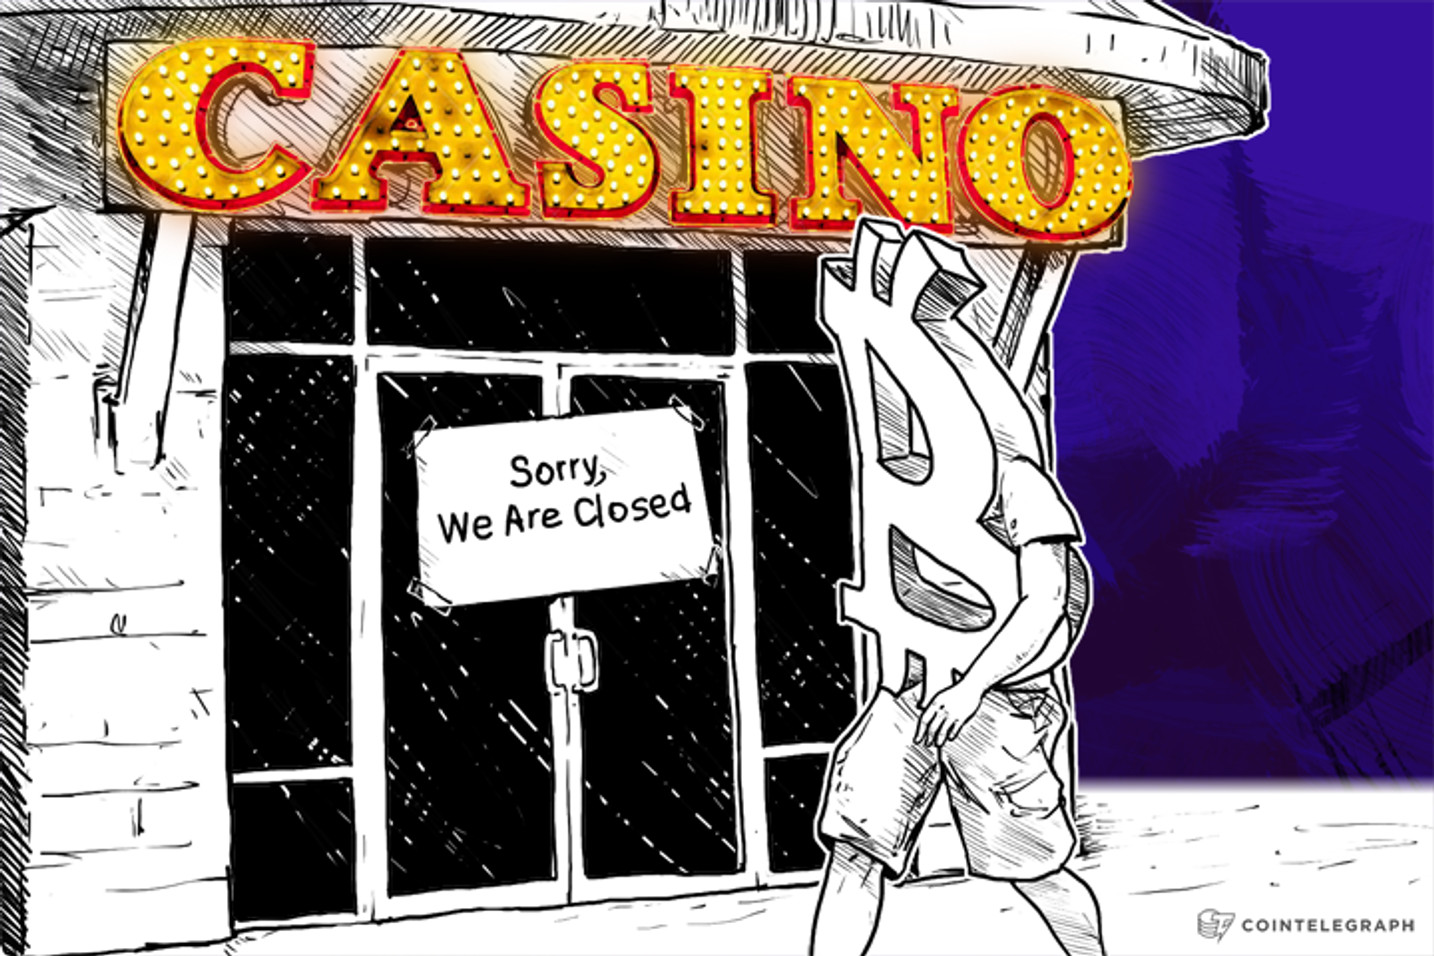 Internet Gambling Ban: Bitcoin Boom or Bane?